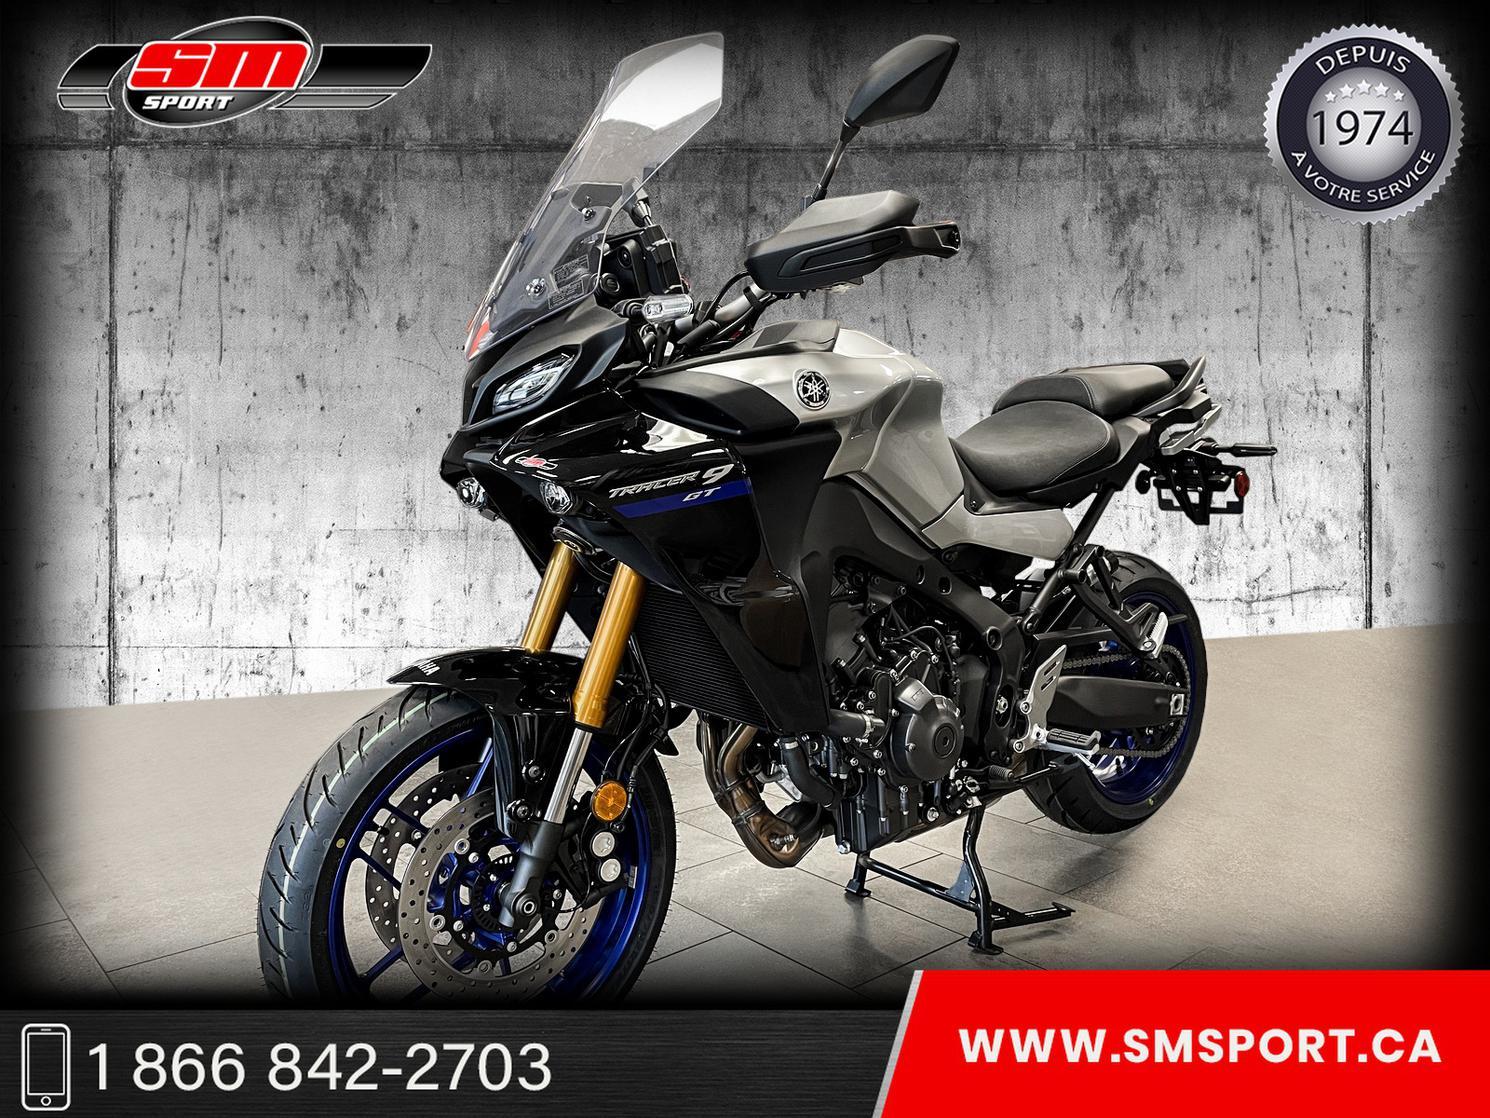 2021 Yamaha TRACER 900 GT - NOUVE MODELE 2021 - DEMO